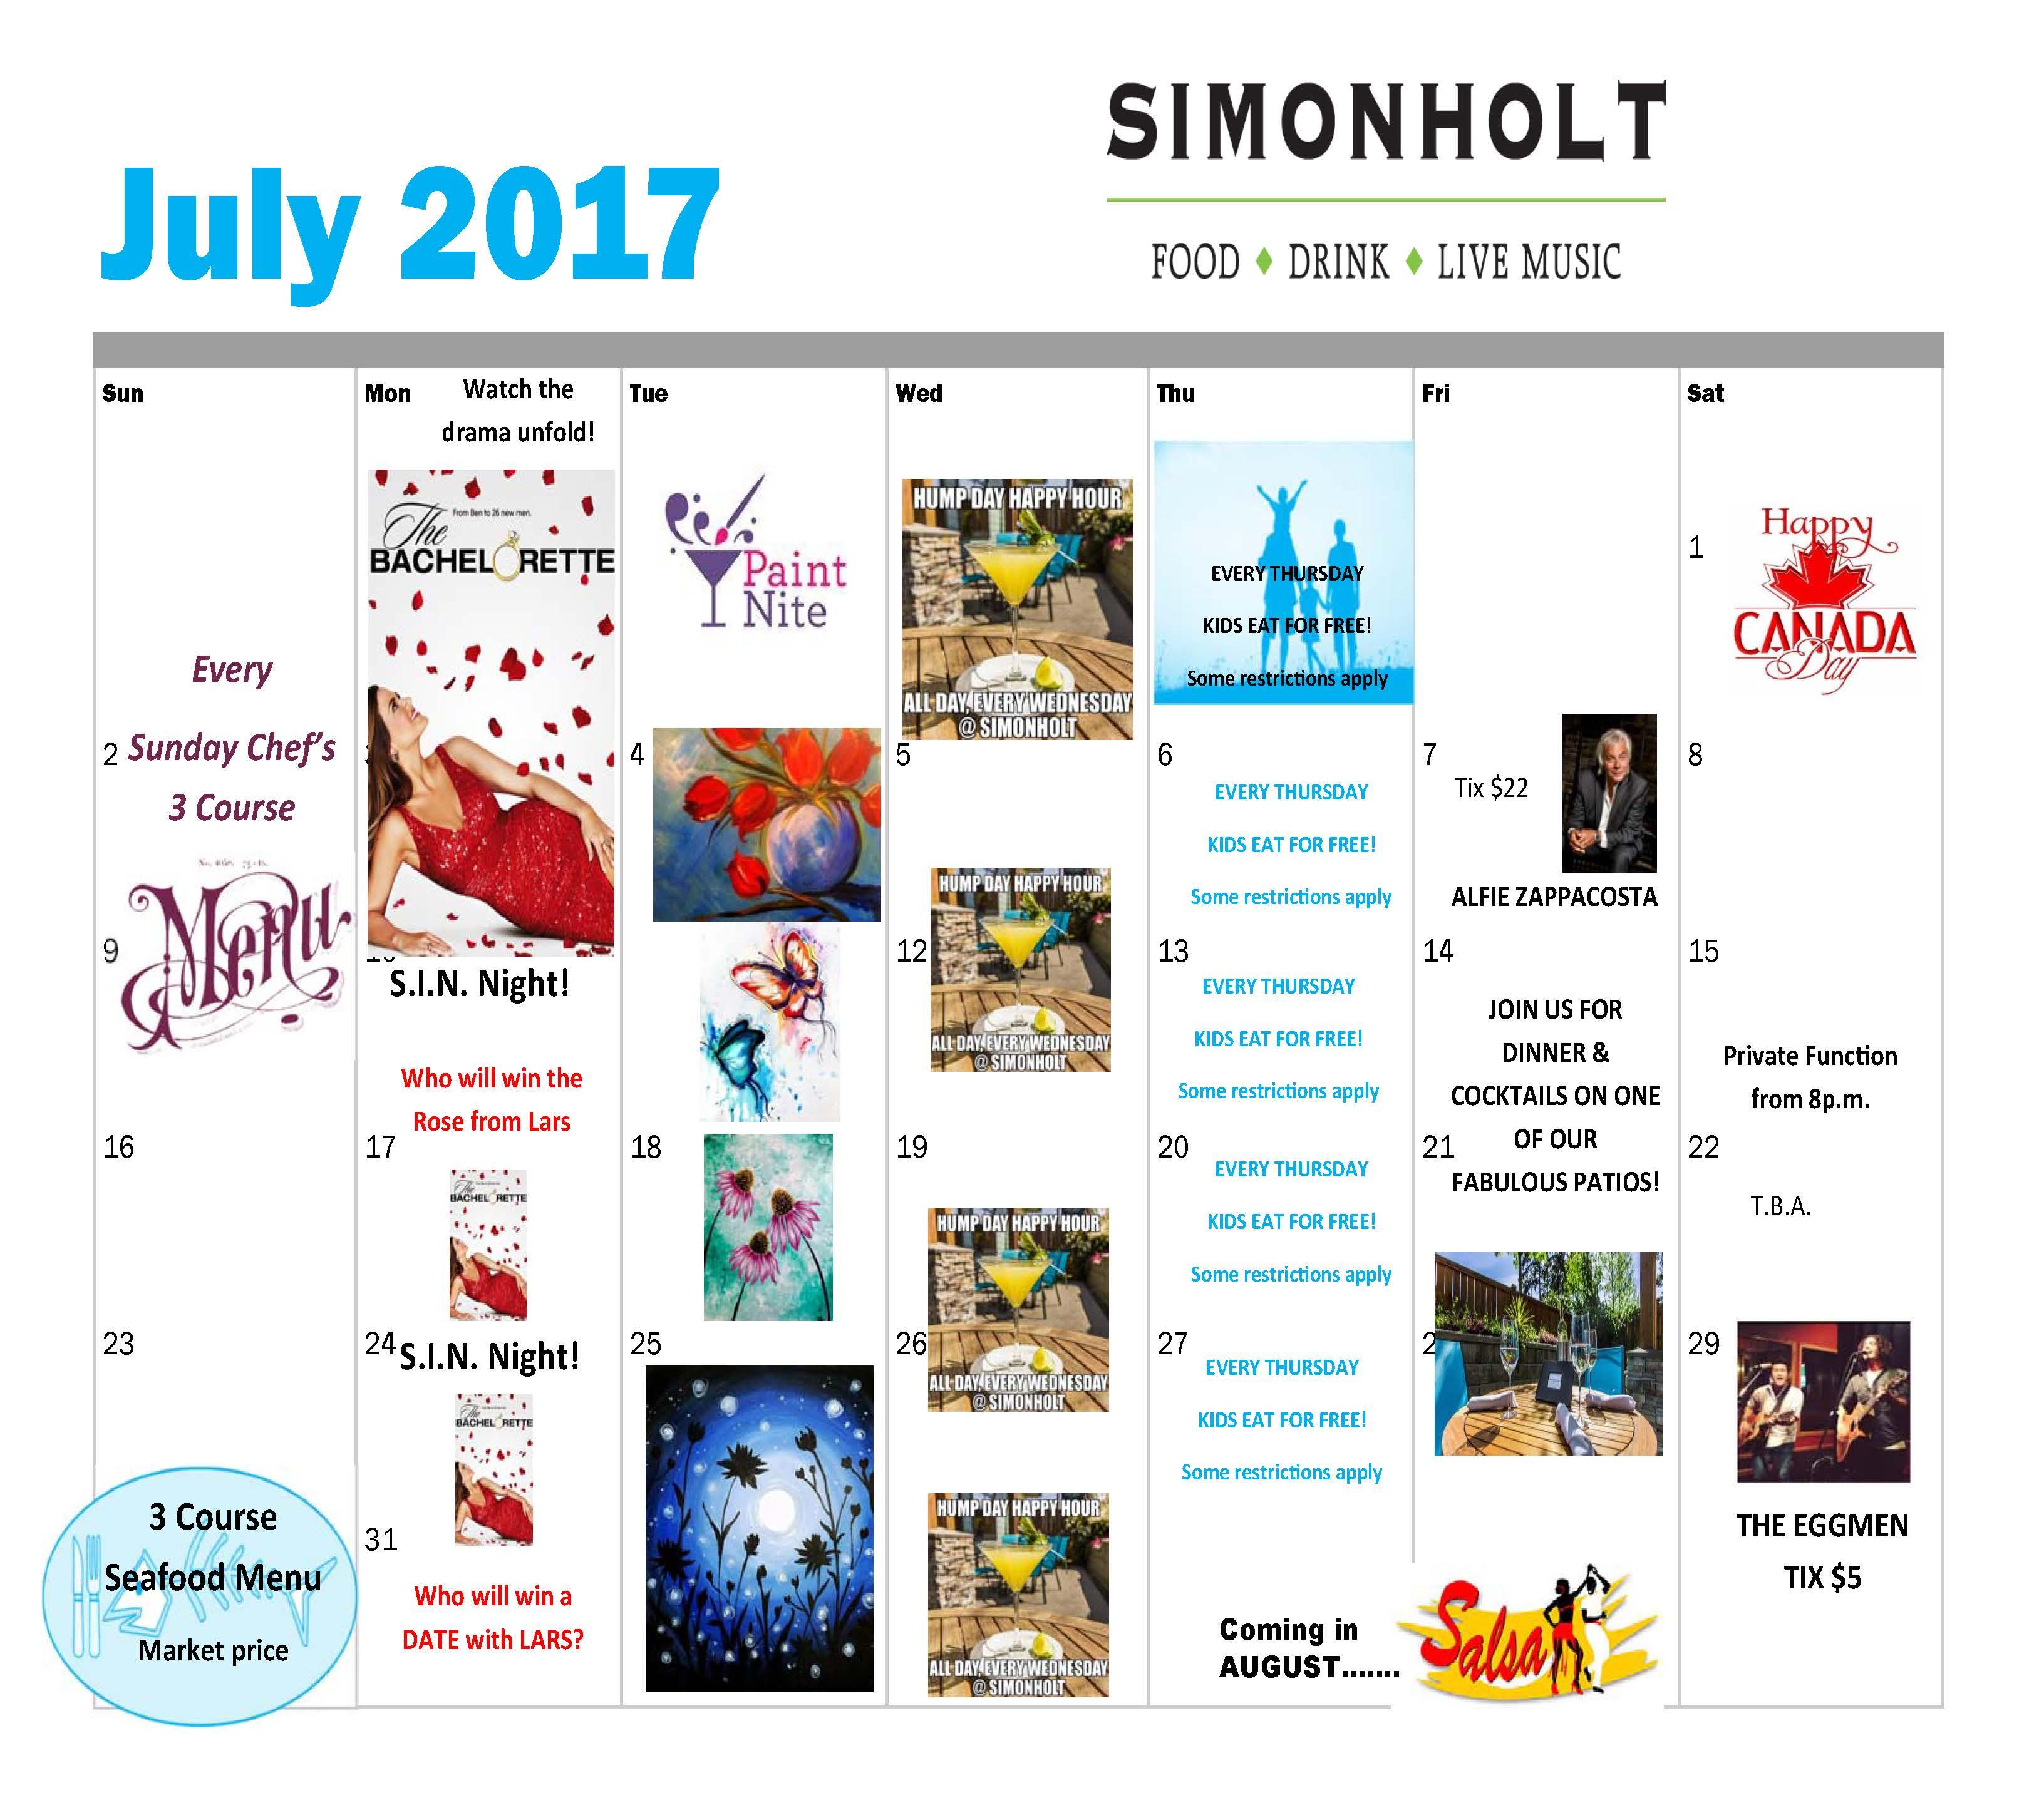 Simonholt July 2017 Calendar   SIMONHOLT Restaurant   FOOD